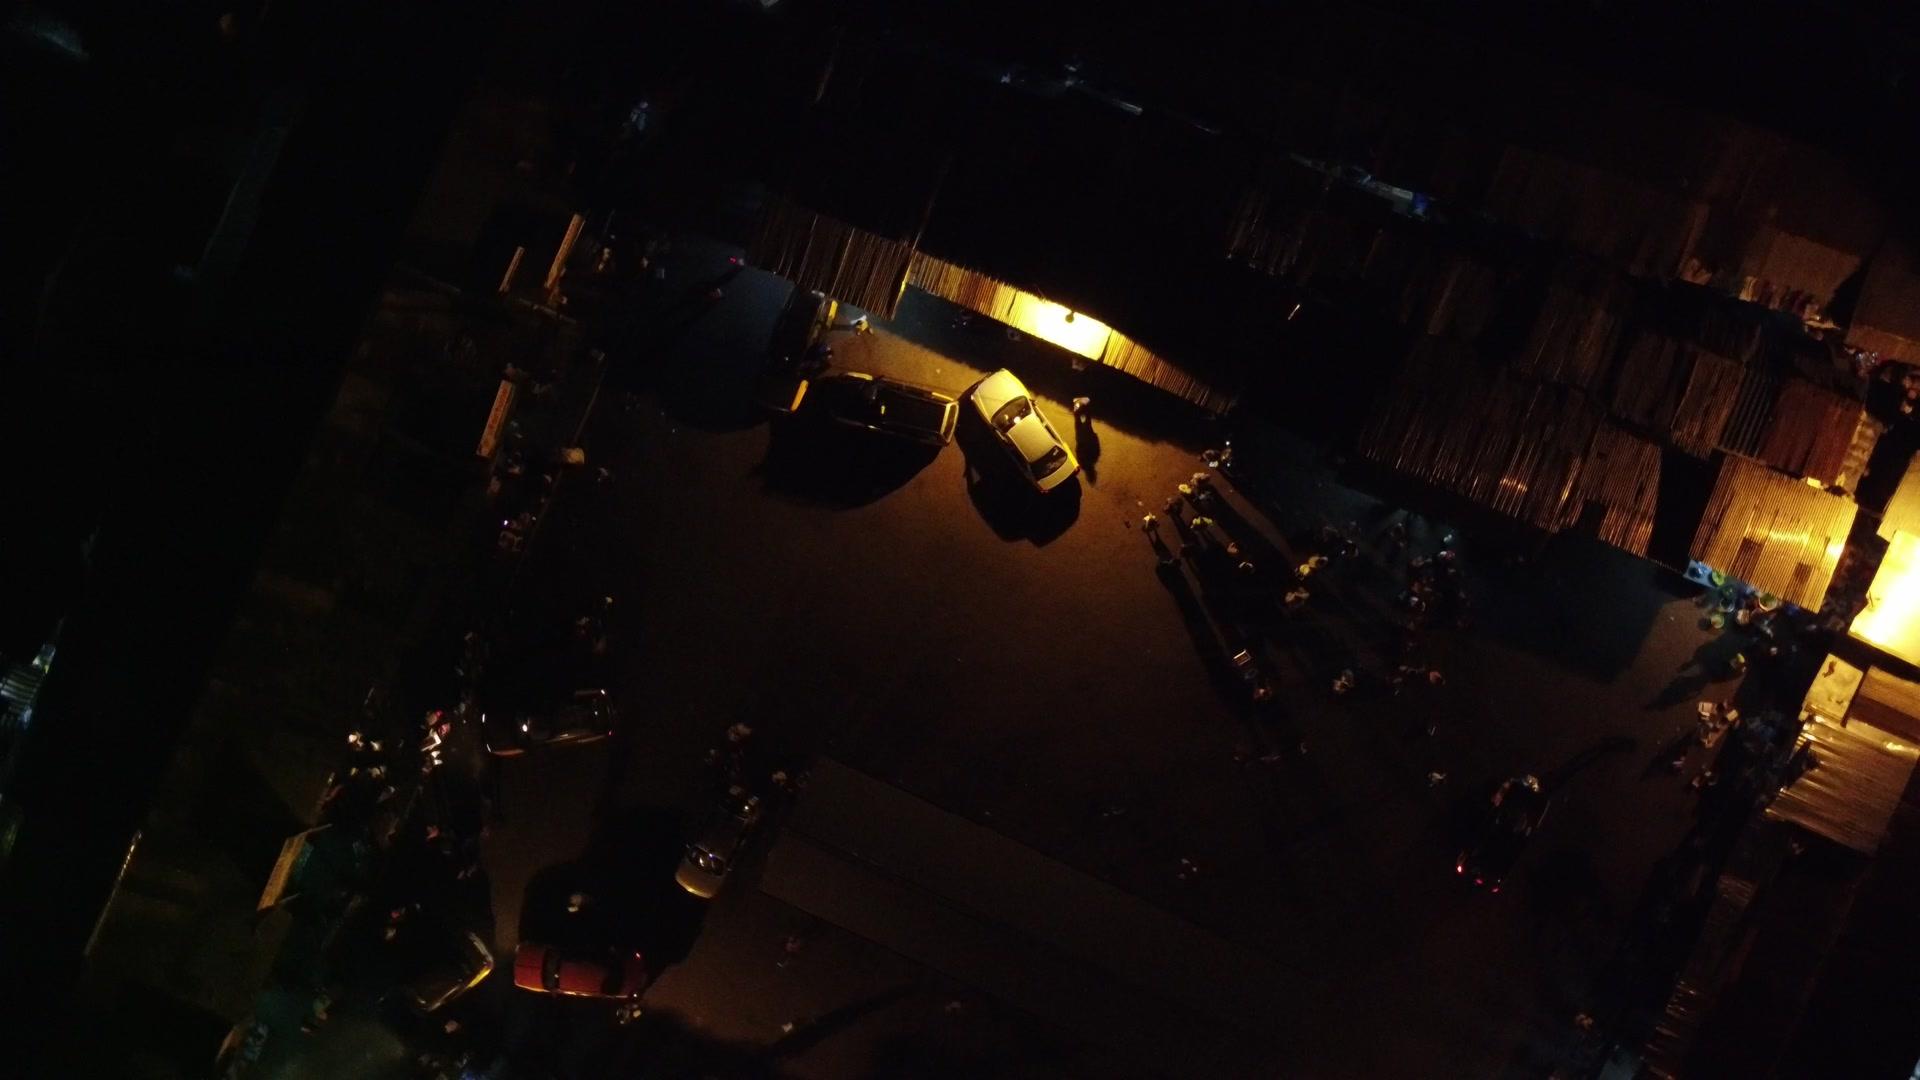 Koforidua Taxi Rank Night Top Down View Spin